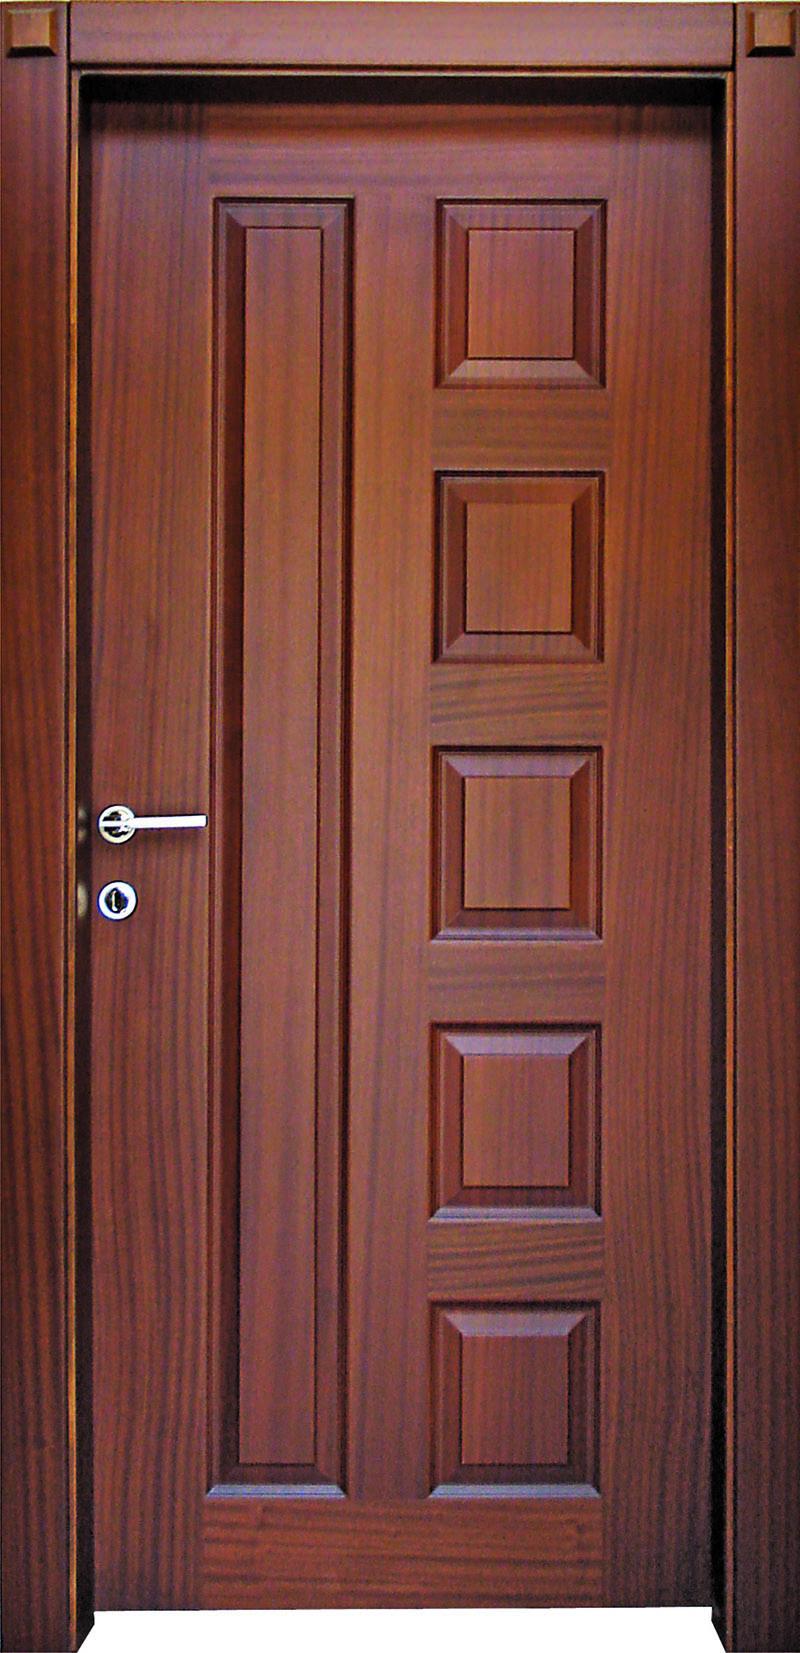 <!--:tr-->Kapı<!--:-->